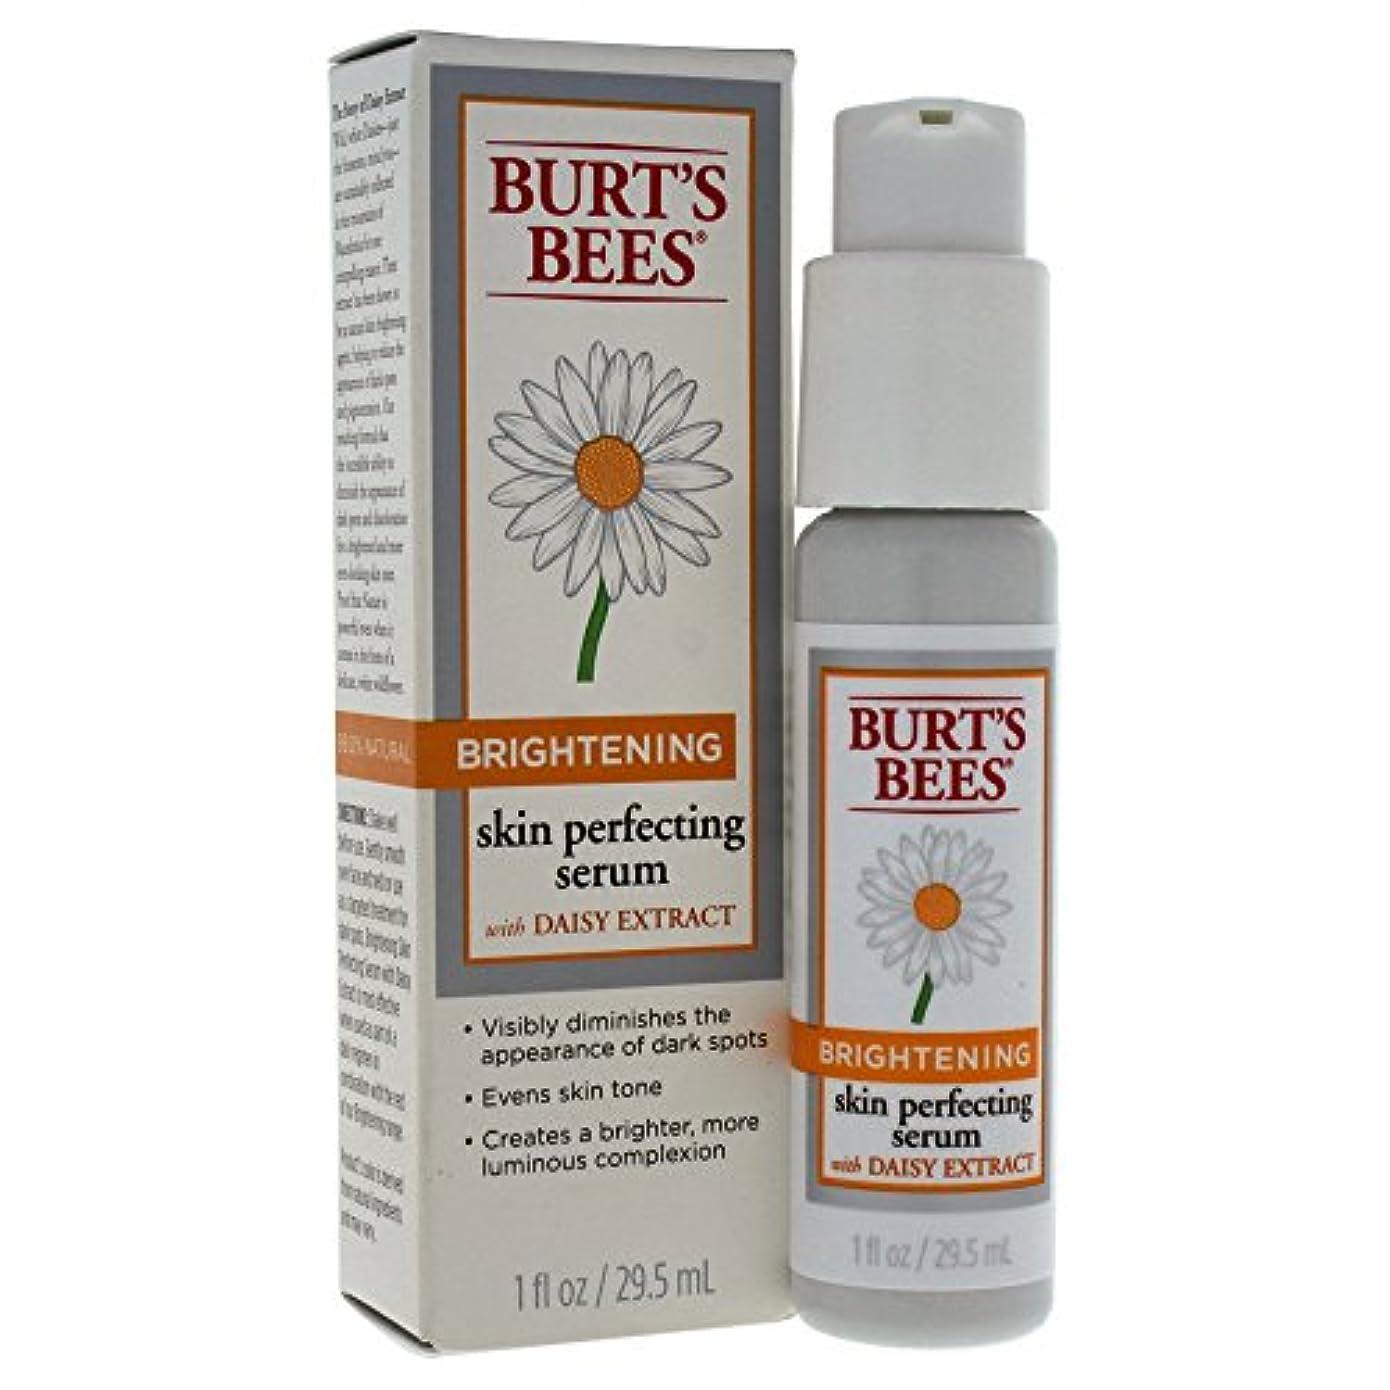 Burt's Bees Brightening Dark Spot Corrector - 30ml by Burt's Bees